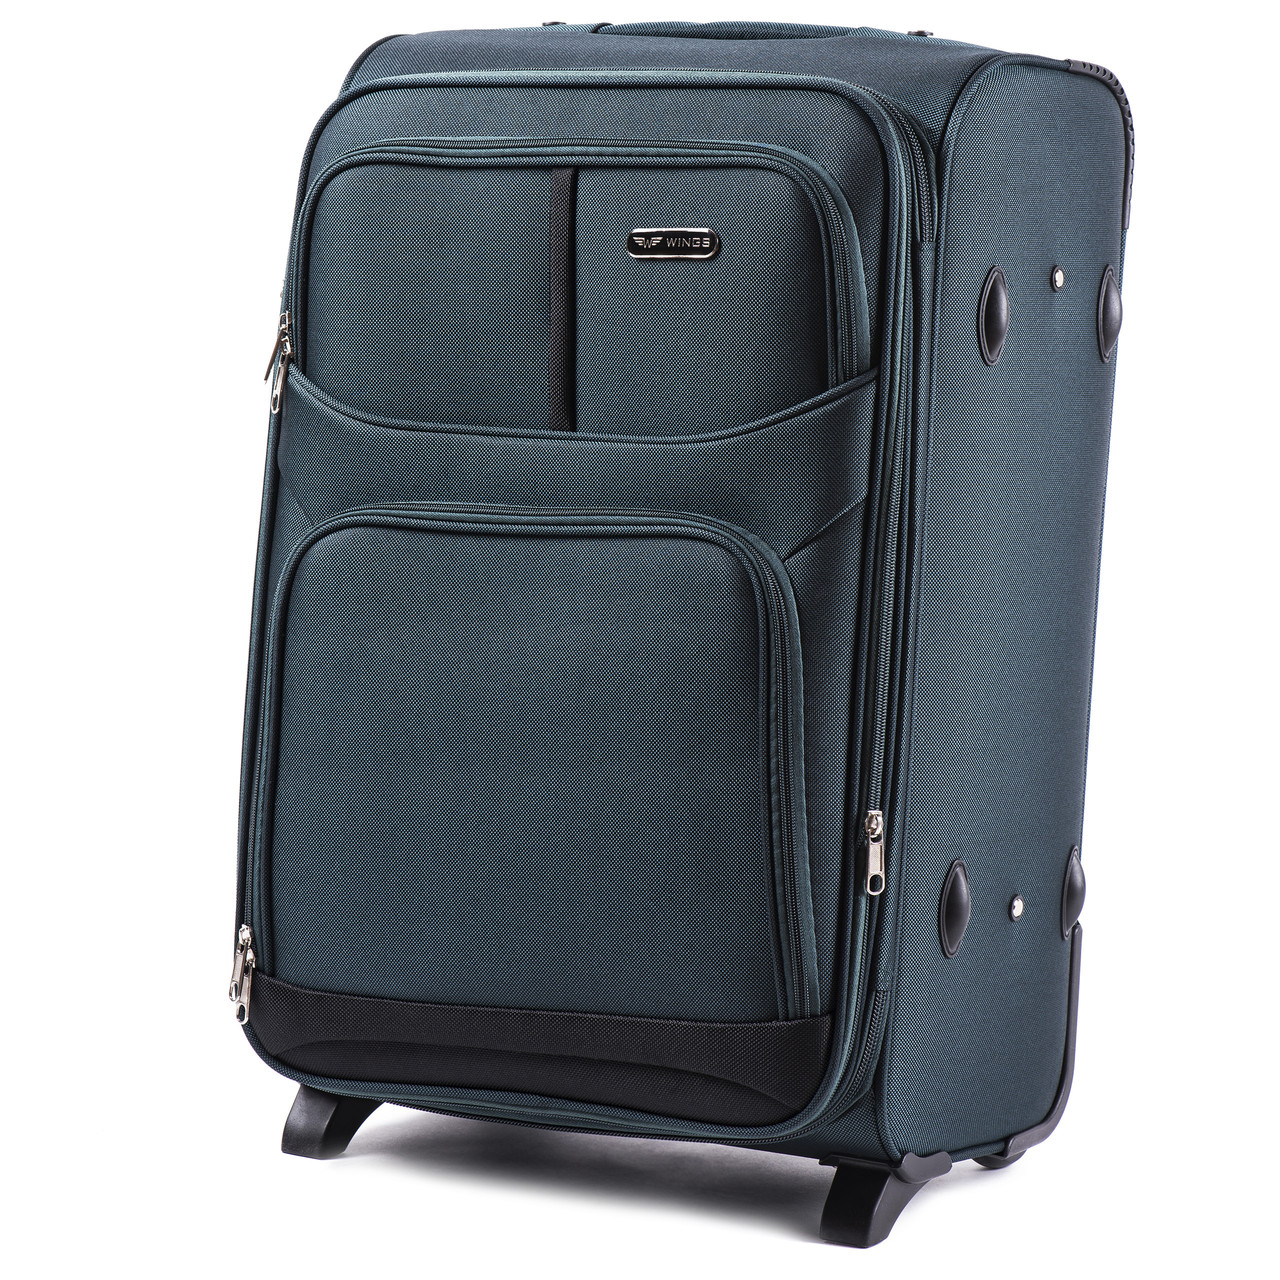 Средний тканевый чемодан Wings 206 на 2 колесах зеленый, фото 1